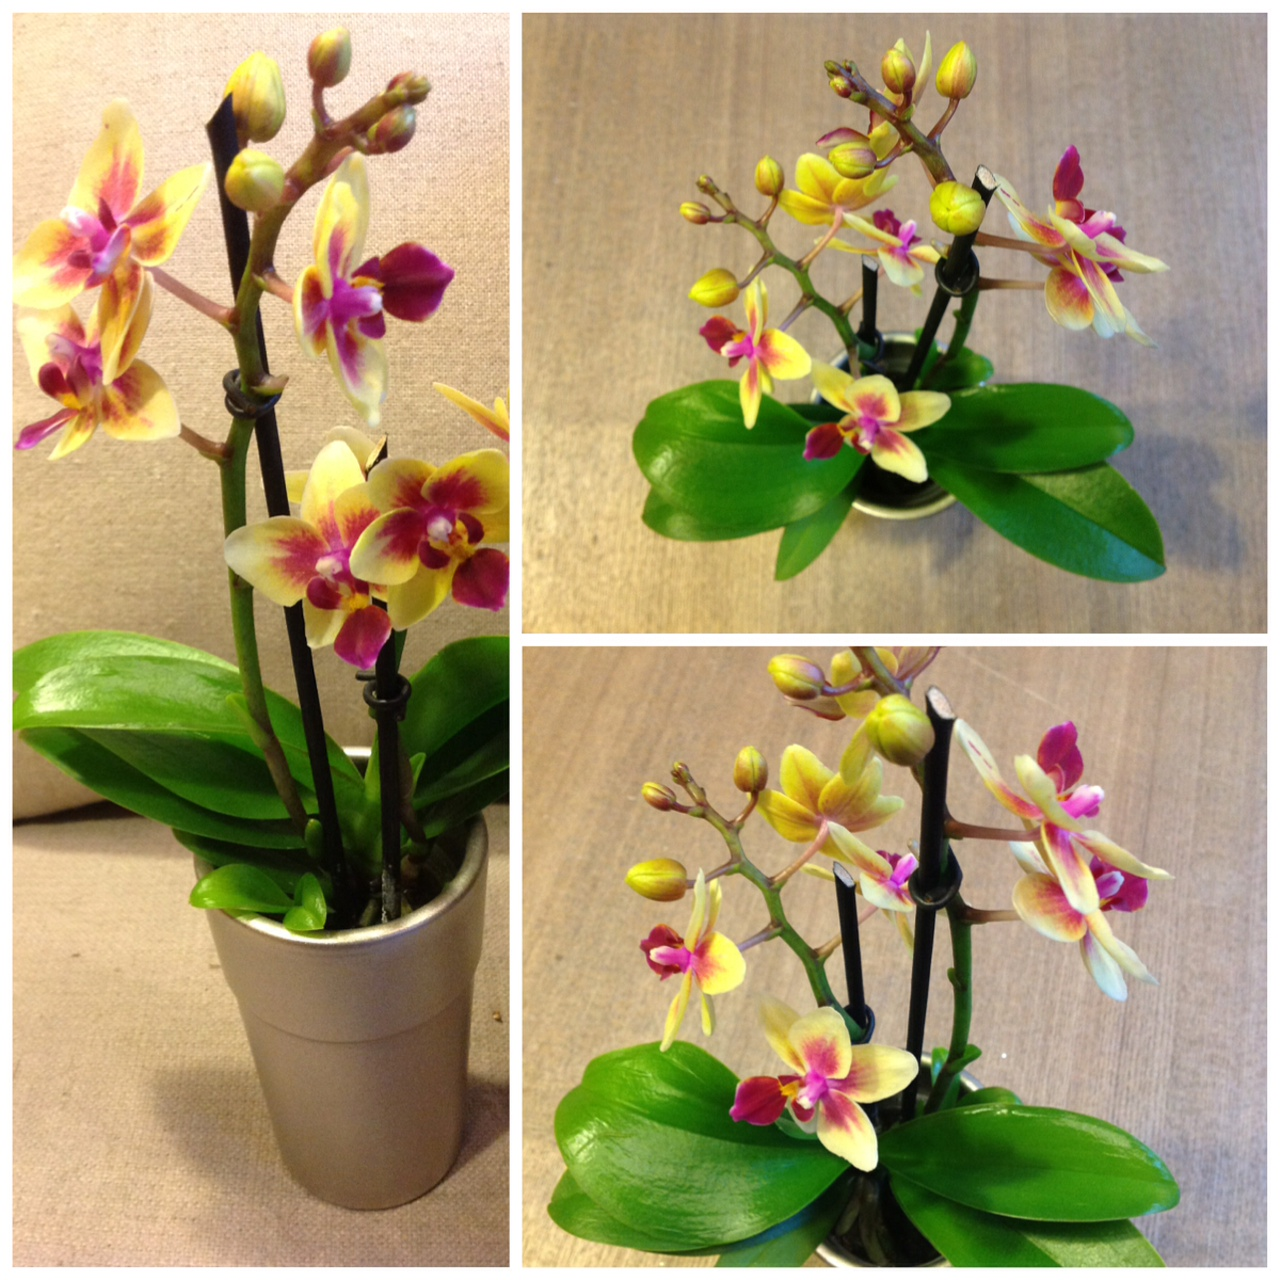 Sweetpea S Mini Orchids